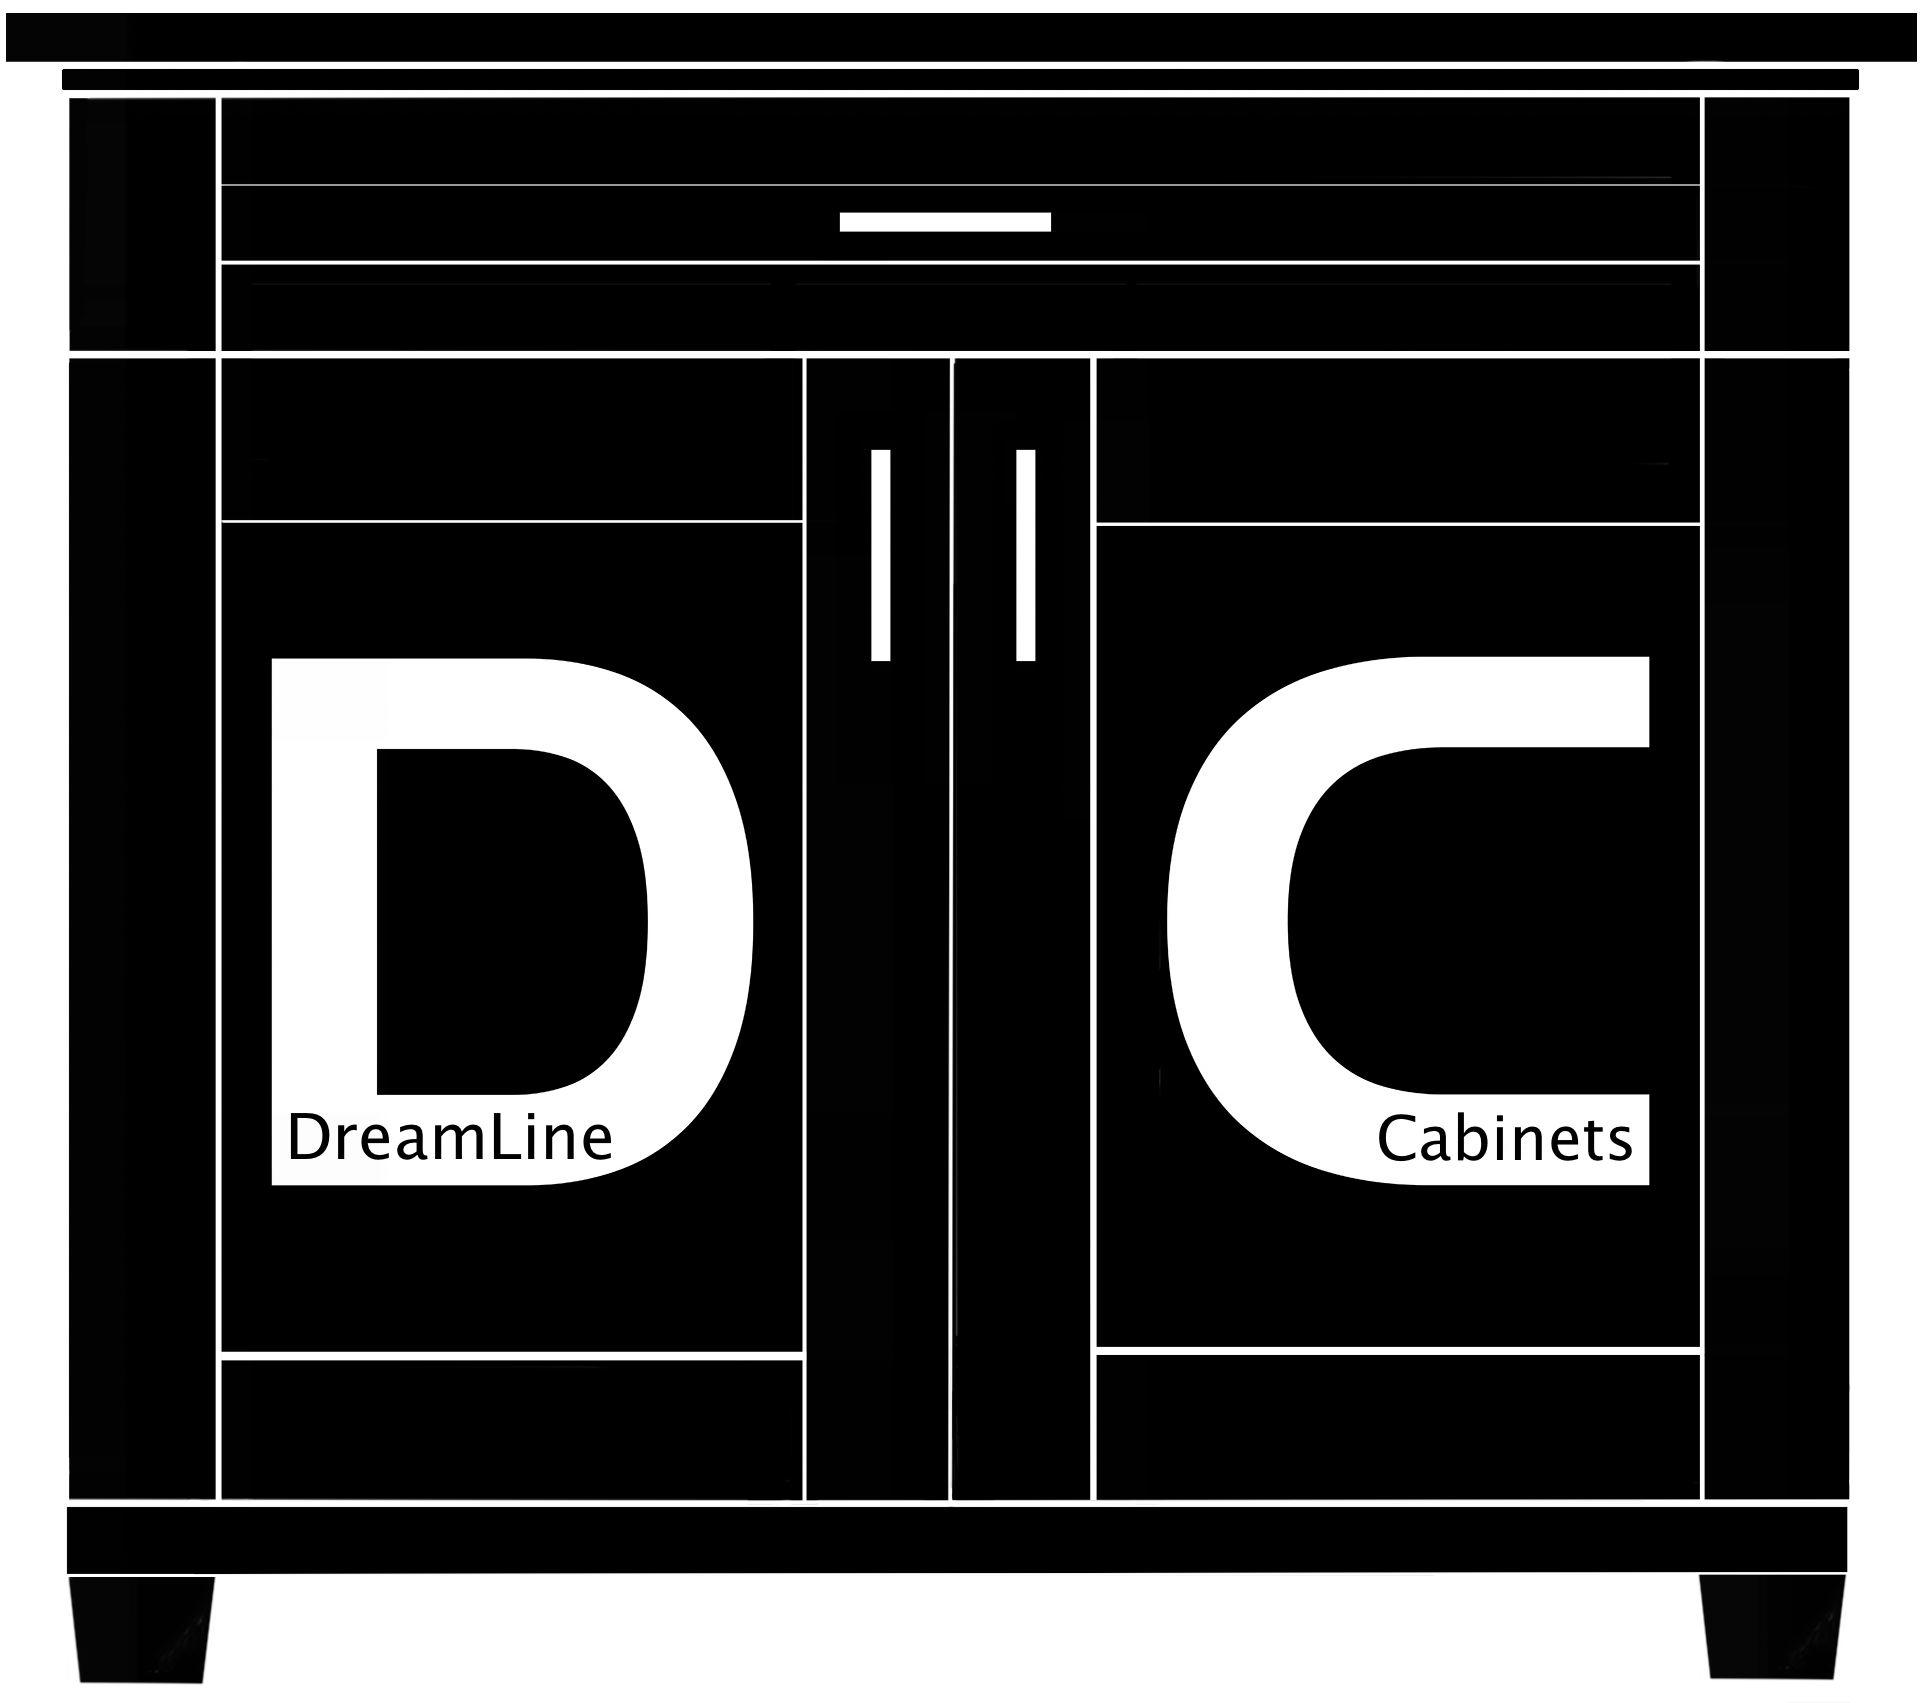 Dreamline, Inc.